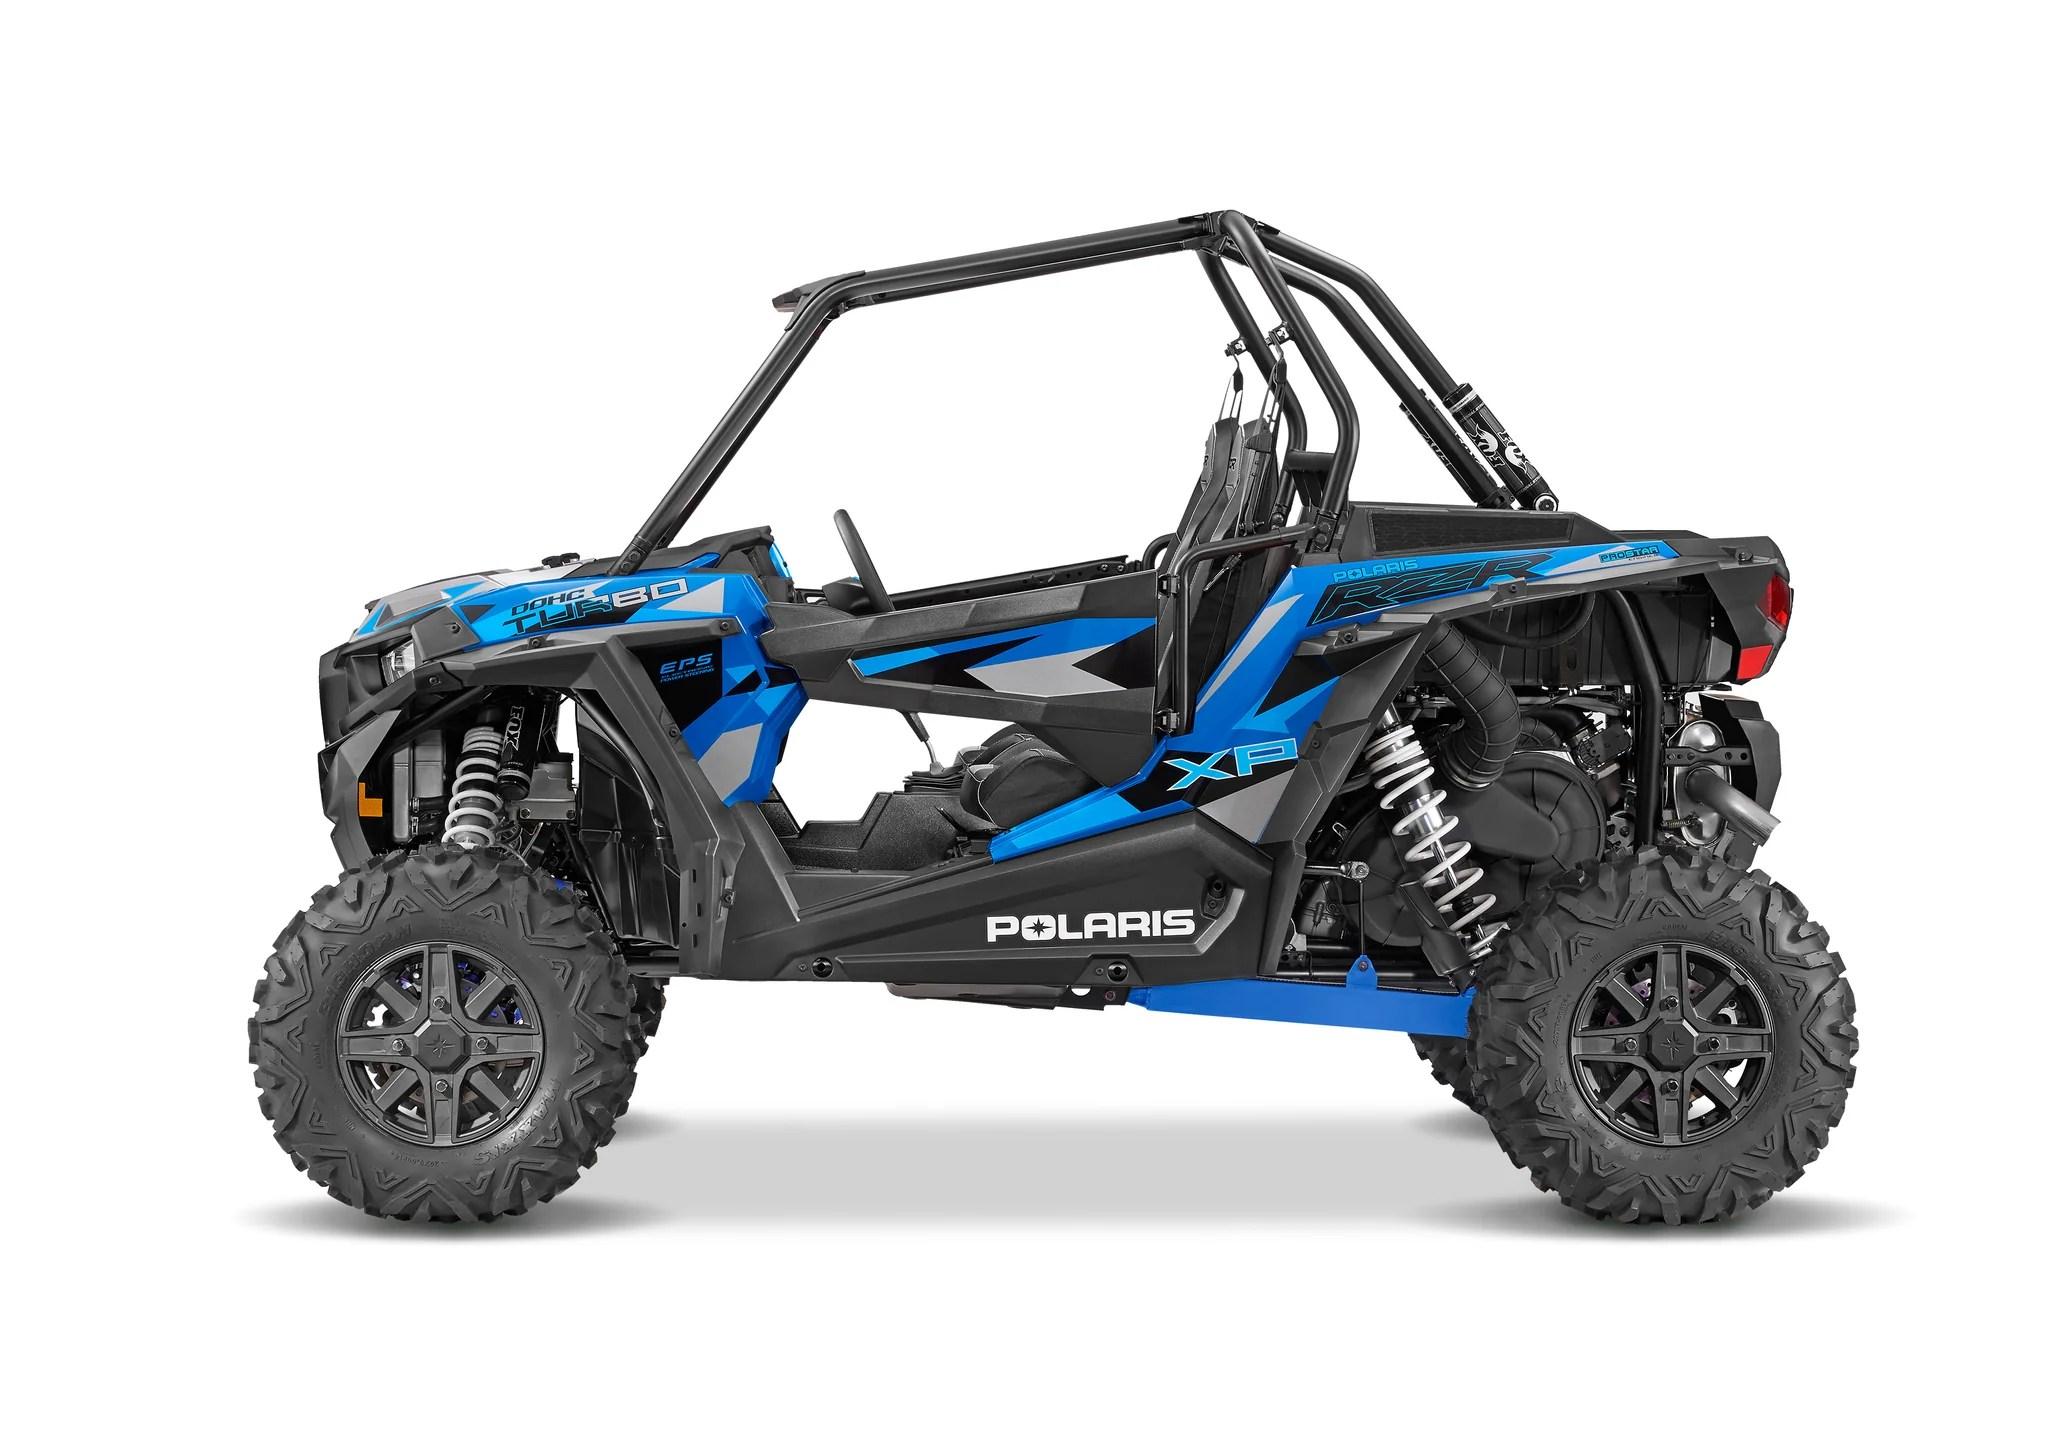 medium resolution of ryco street legal kit for polaris rzr turbo s turbo 1000 900 2015